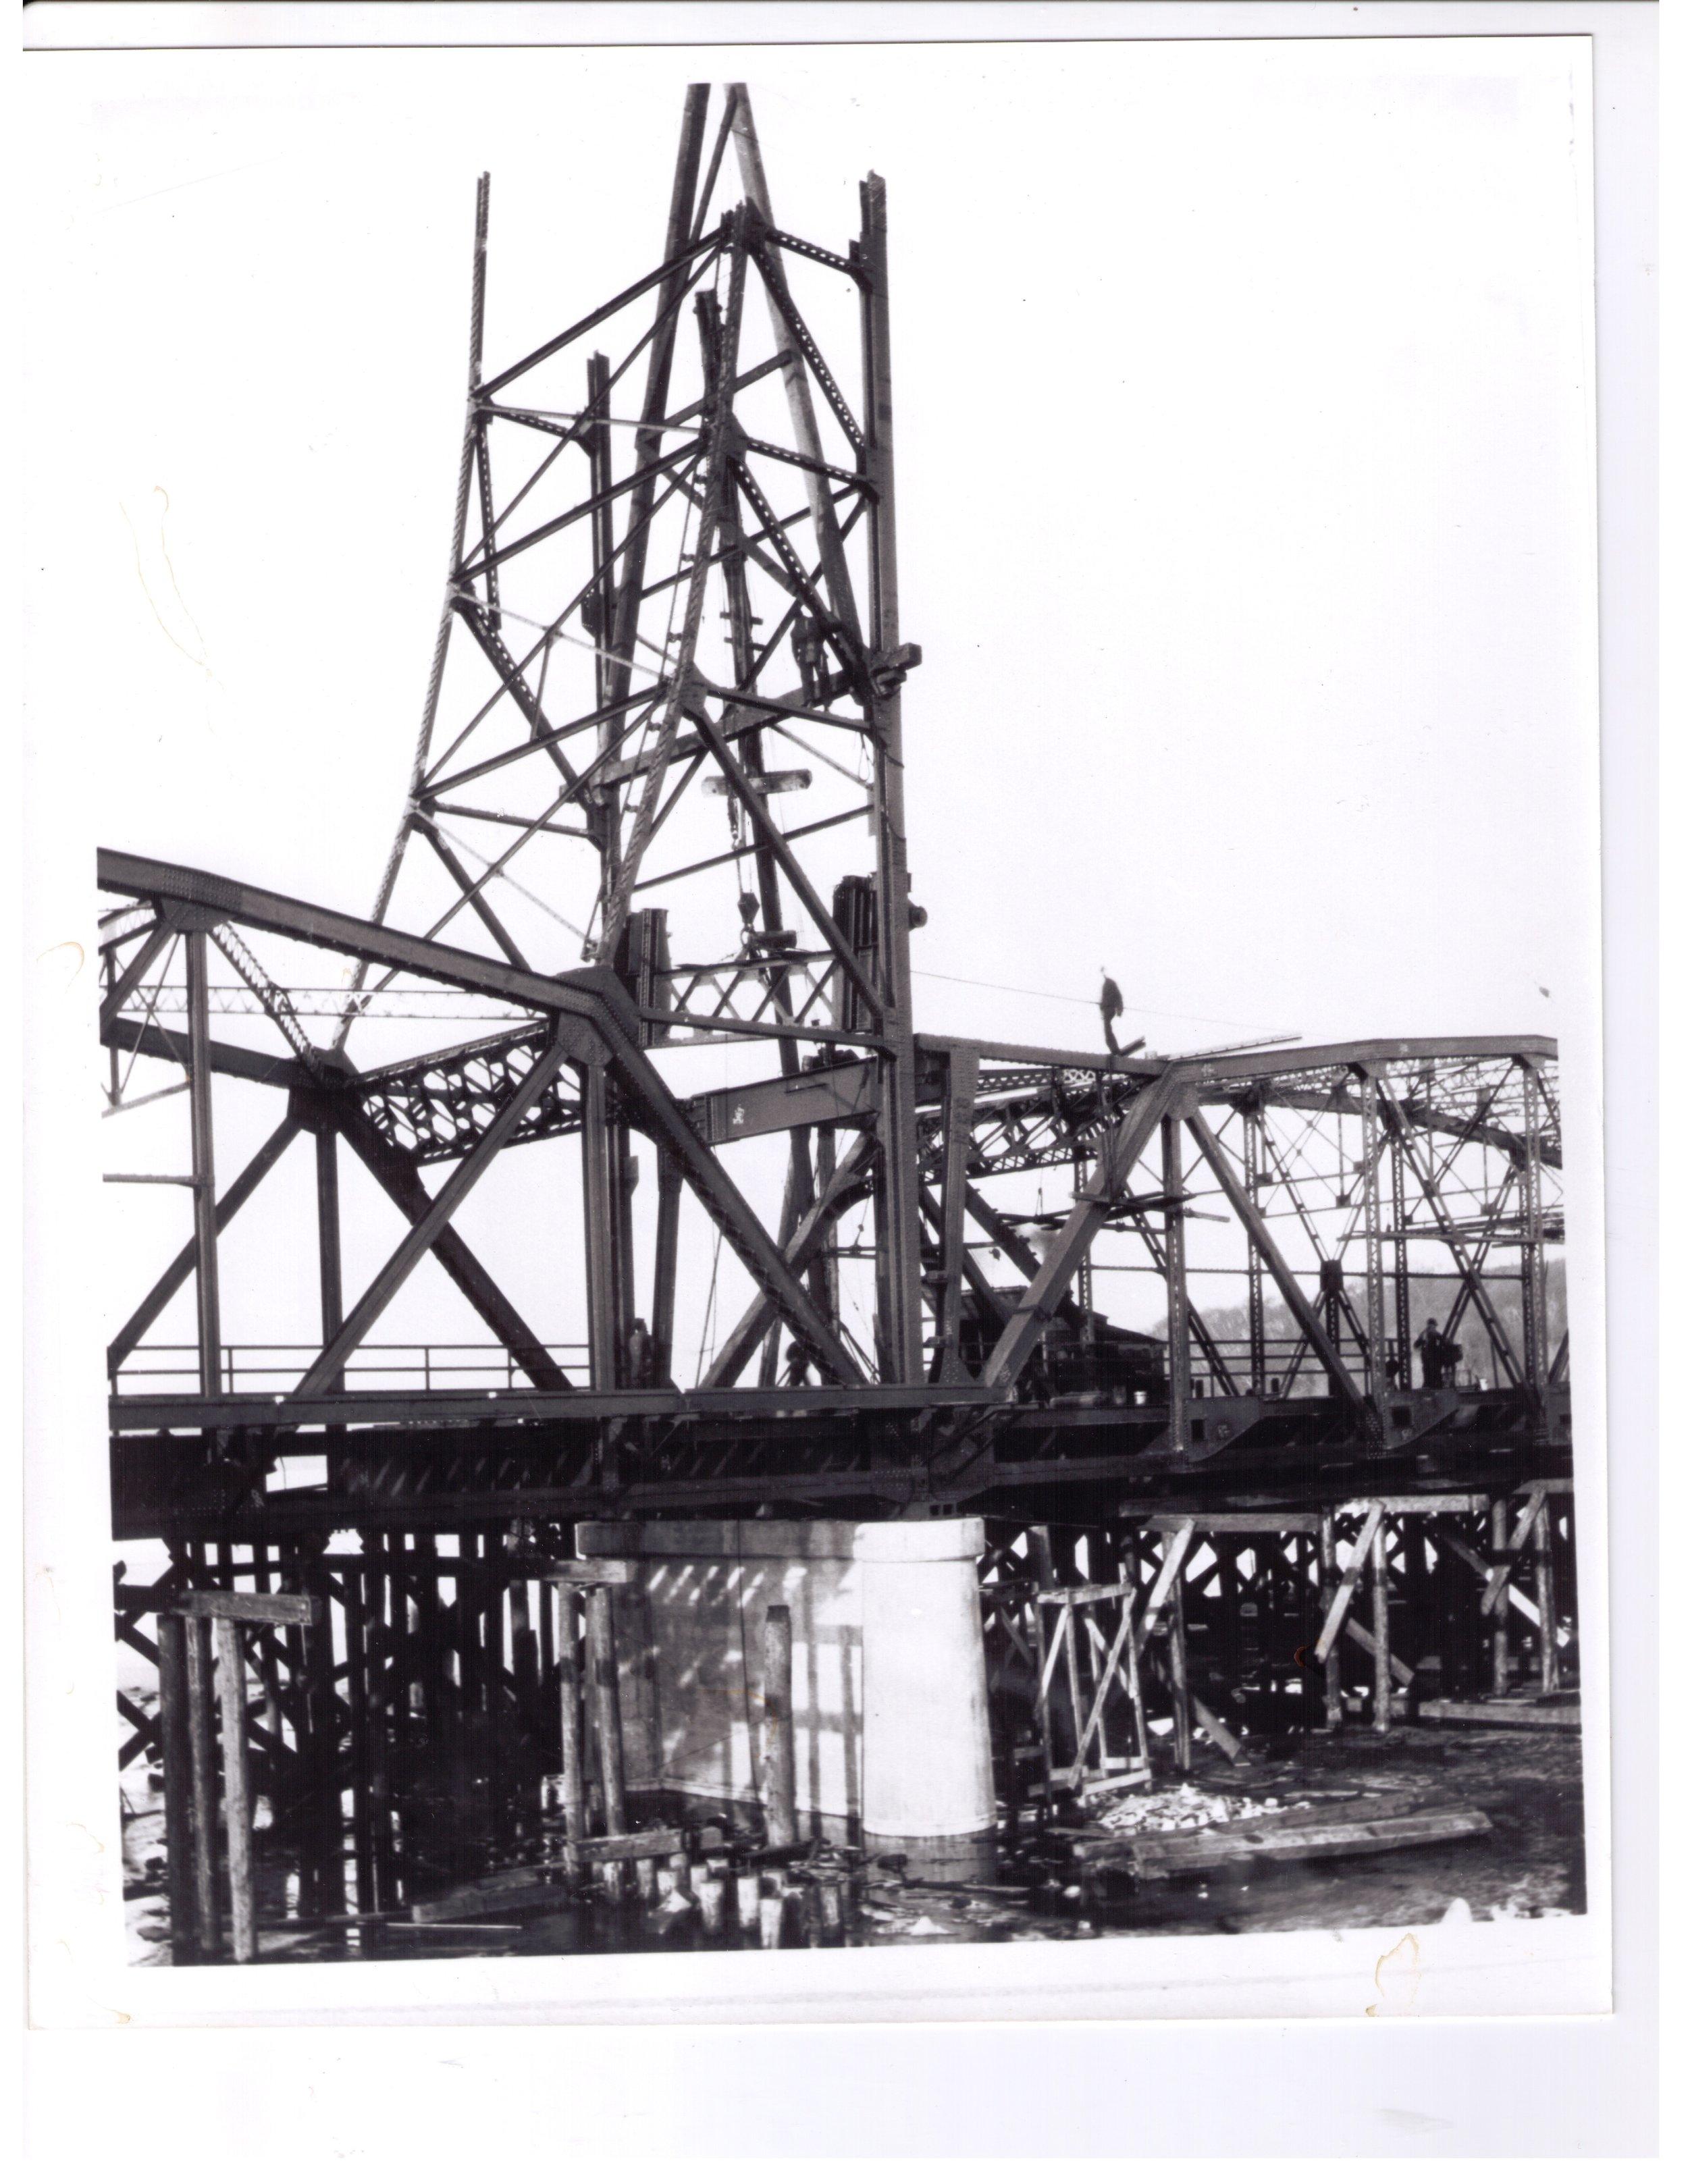 Lift Bridge Under Construction in 1931. Photo credit, Mr. John Runk, courtesy of Stillwater Public Library.